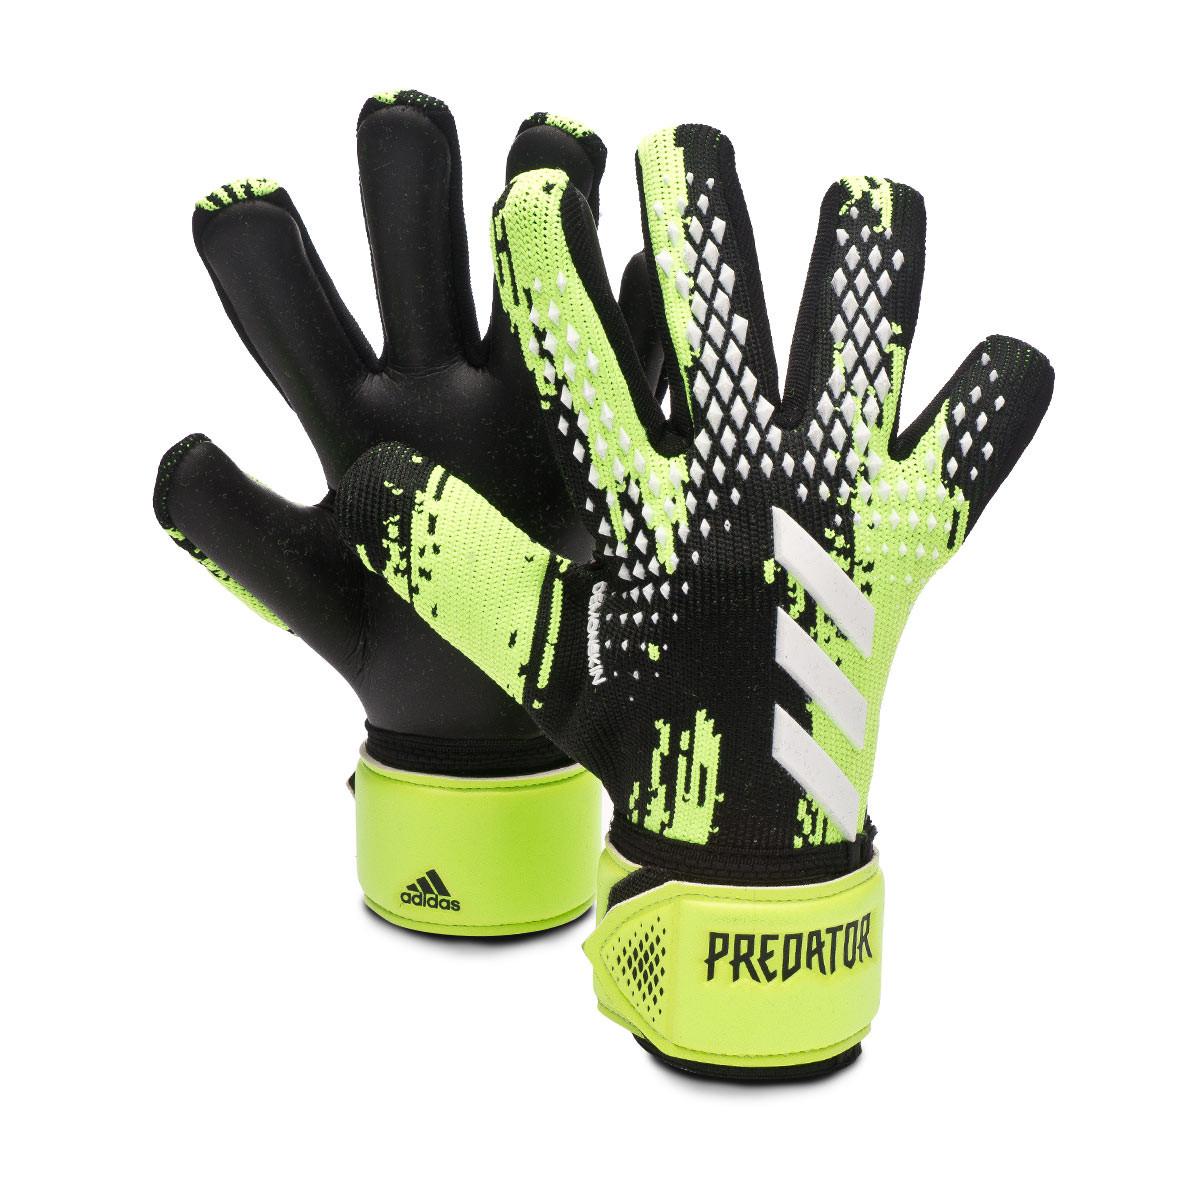 Ocurrencia Neuropatía Ahuyentar  Guante de portero adidas Predator League Niño Signal green-Black-White -  Tienda de fútbol Fútbol Emotion